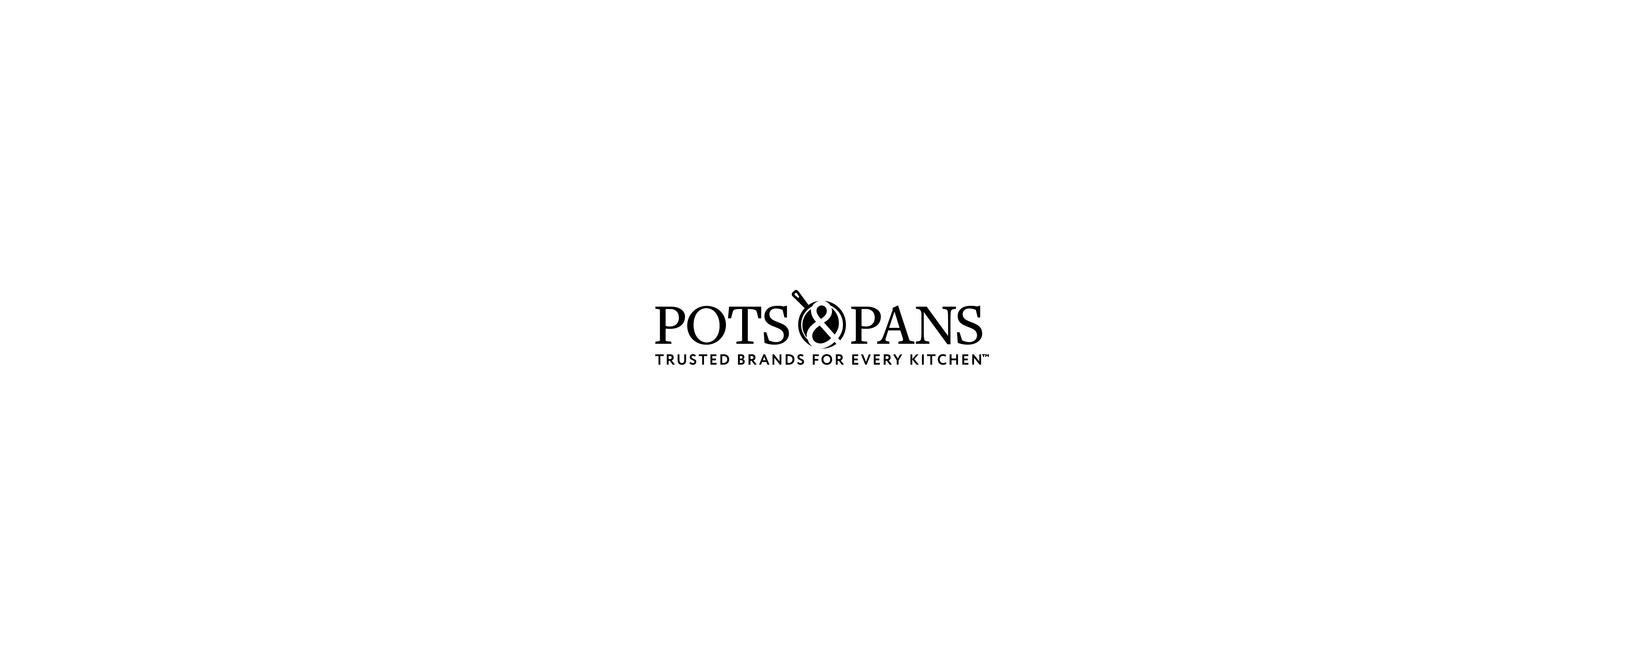 Pots And Pans Coupon Code 2021